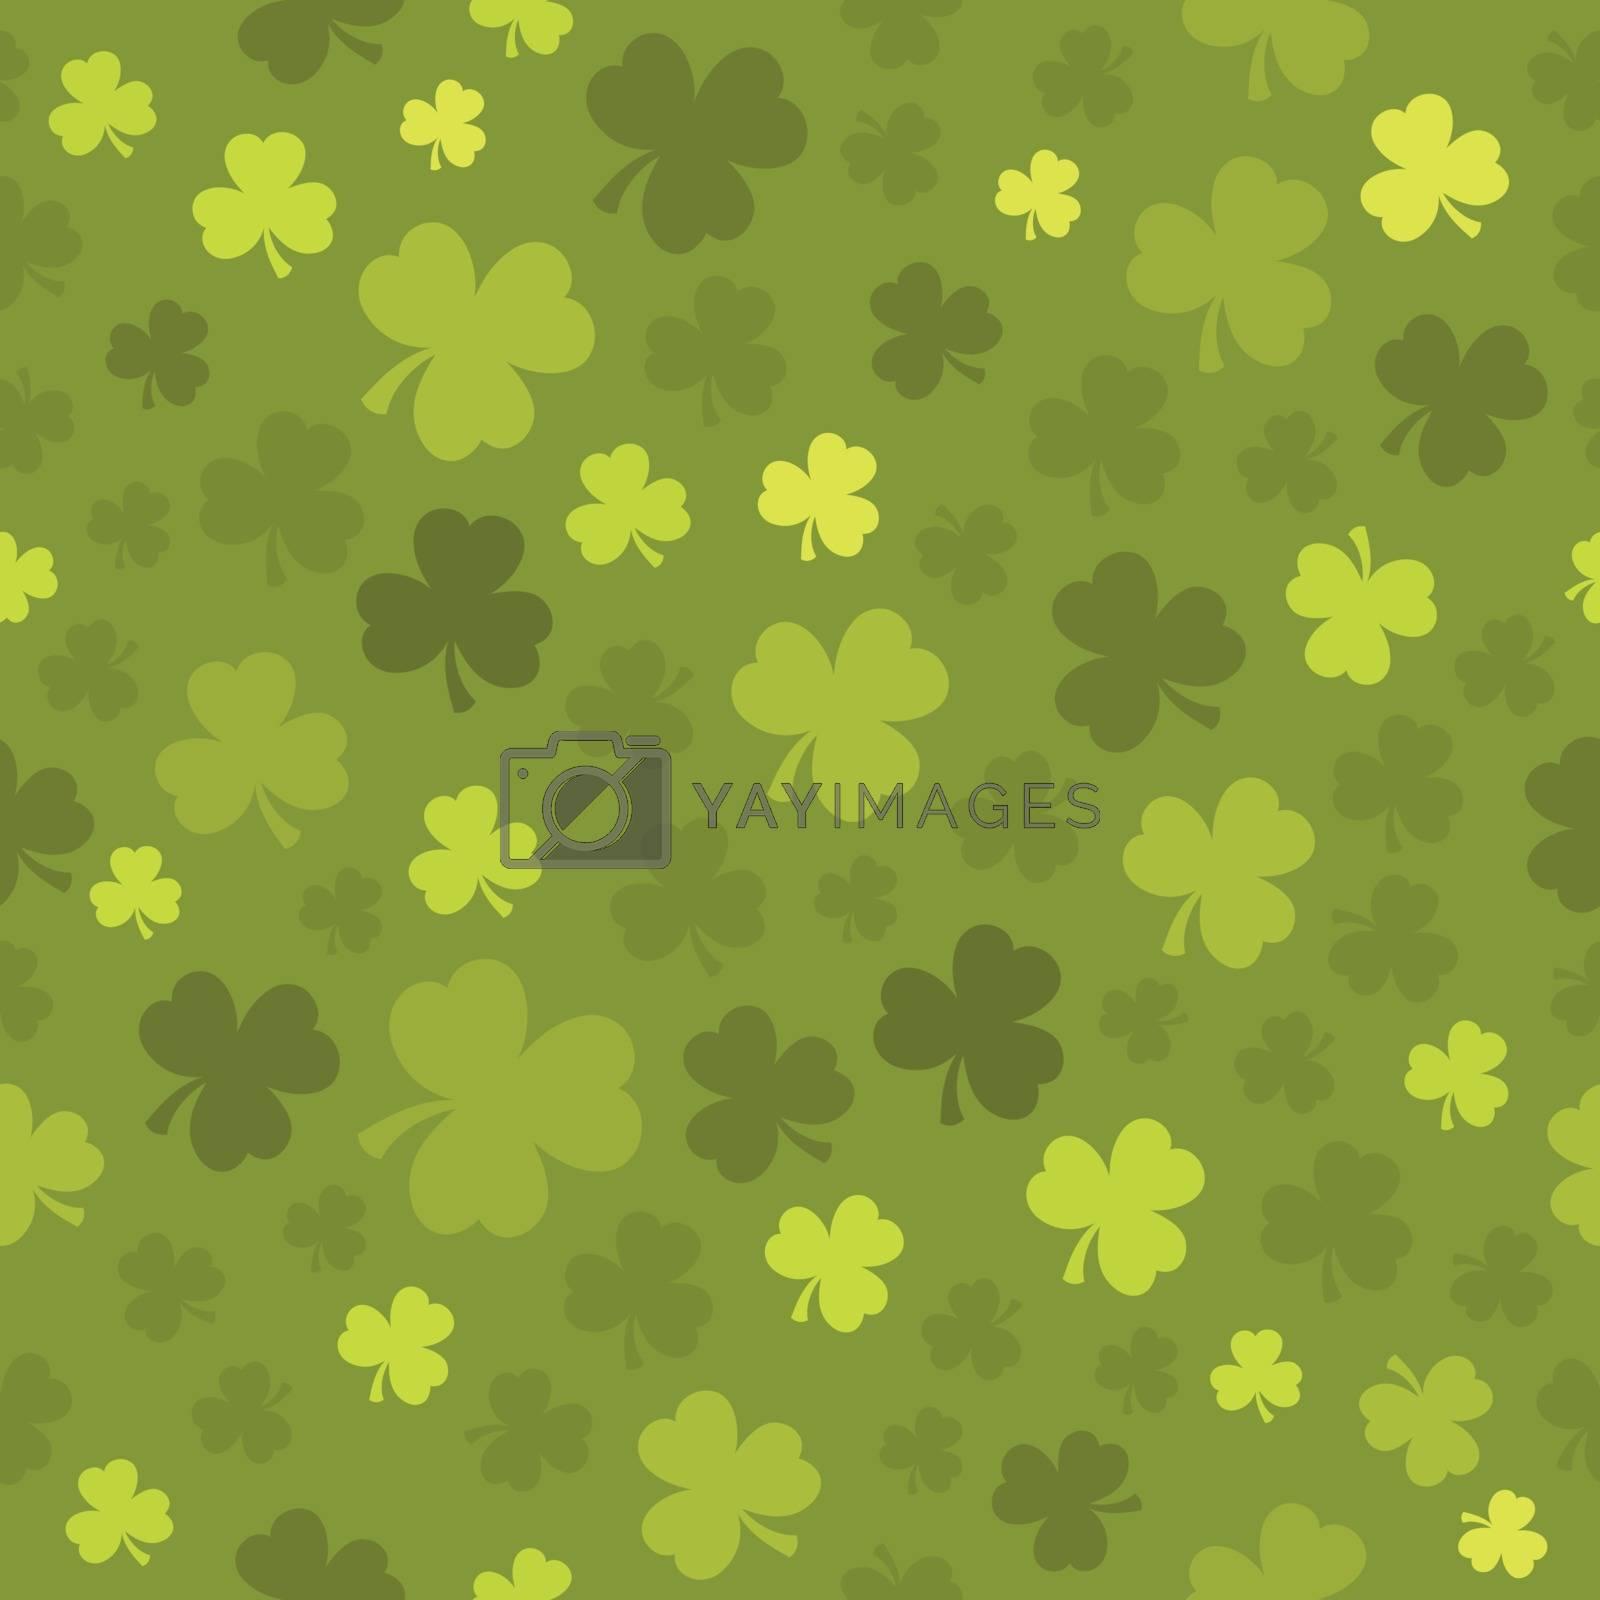 Three leaf clover seamless background 3 - eps10 vector illustration.